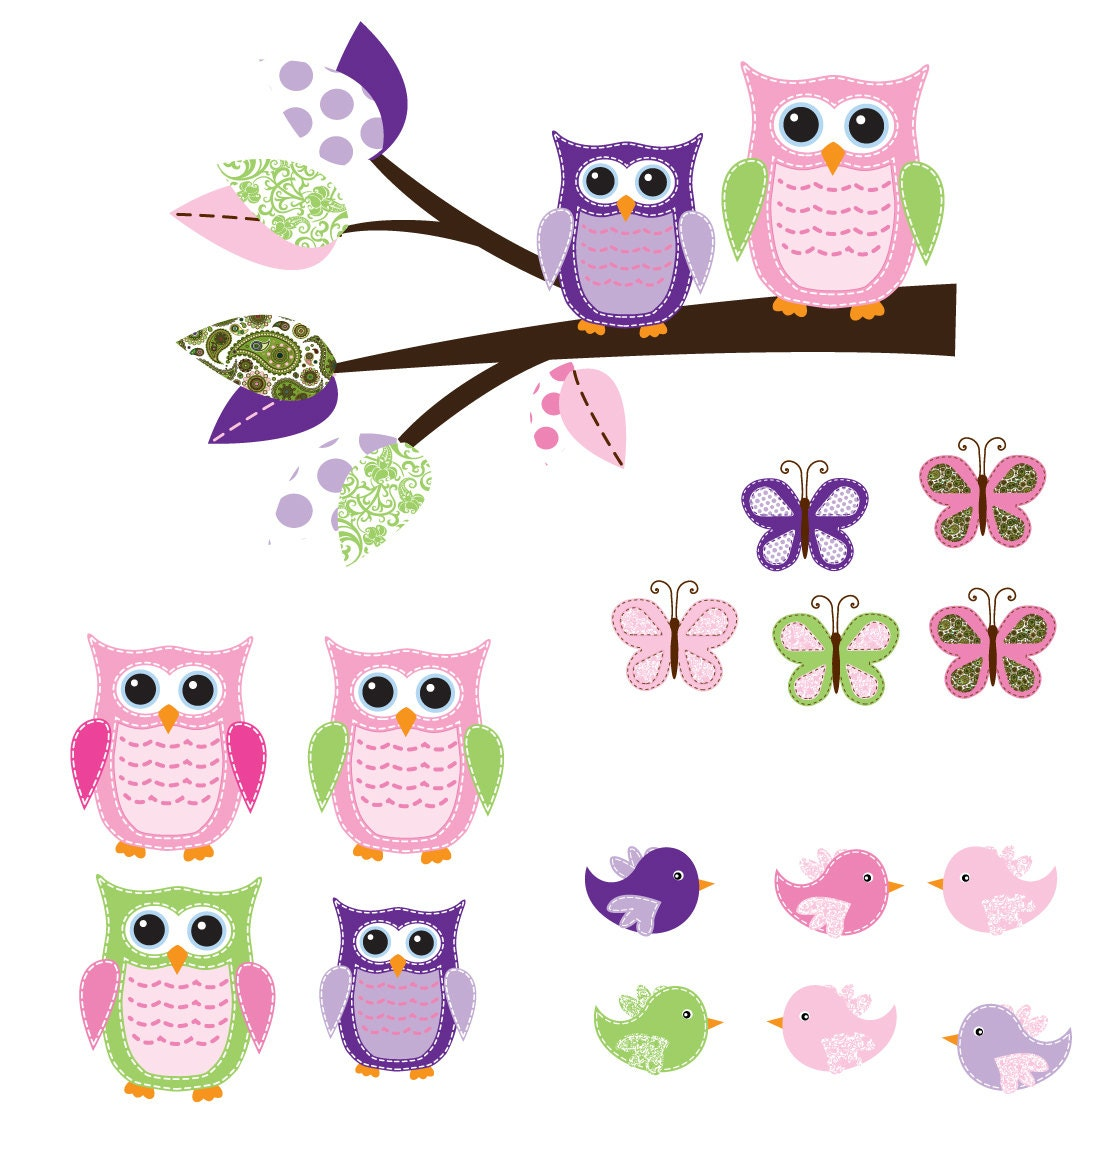 40 Cute Owl Tattoo Design Ideas 2018  thewildtrendscom